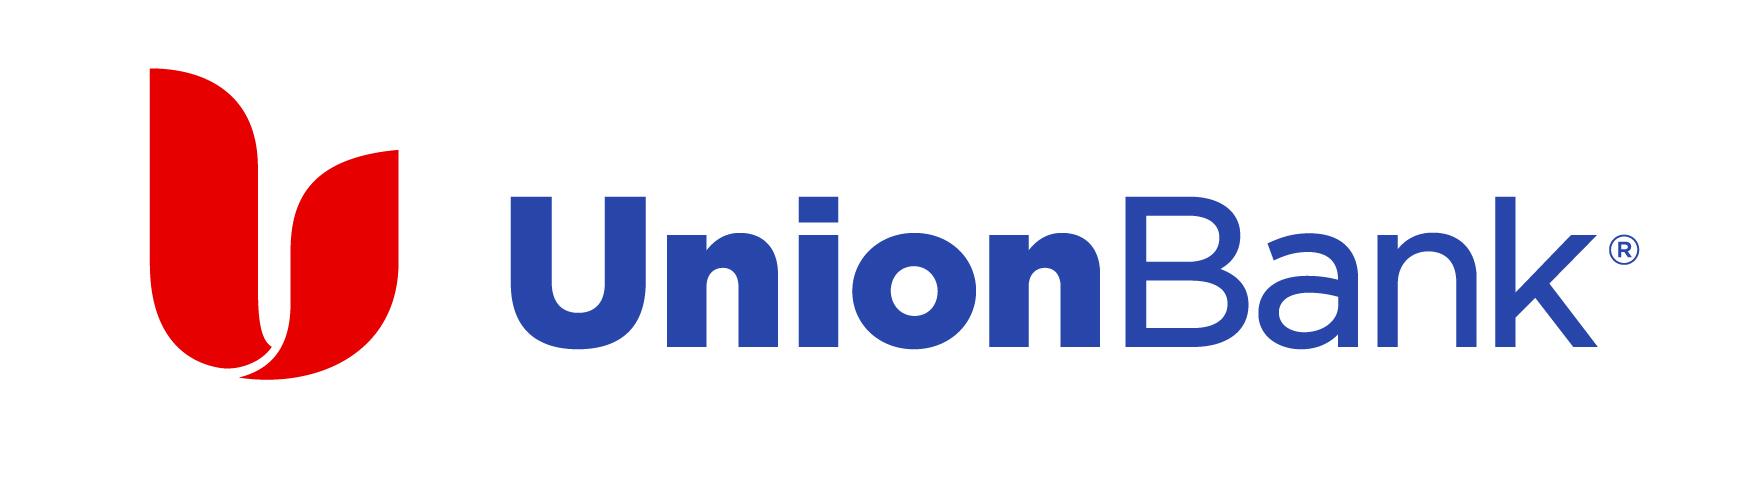 union-bank-logo-1.jpg